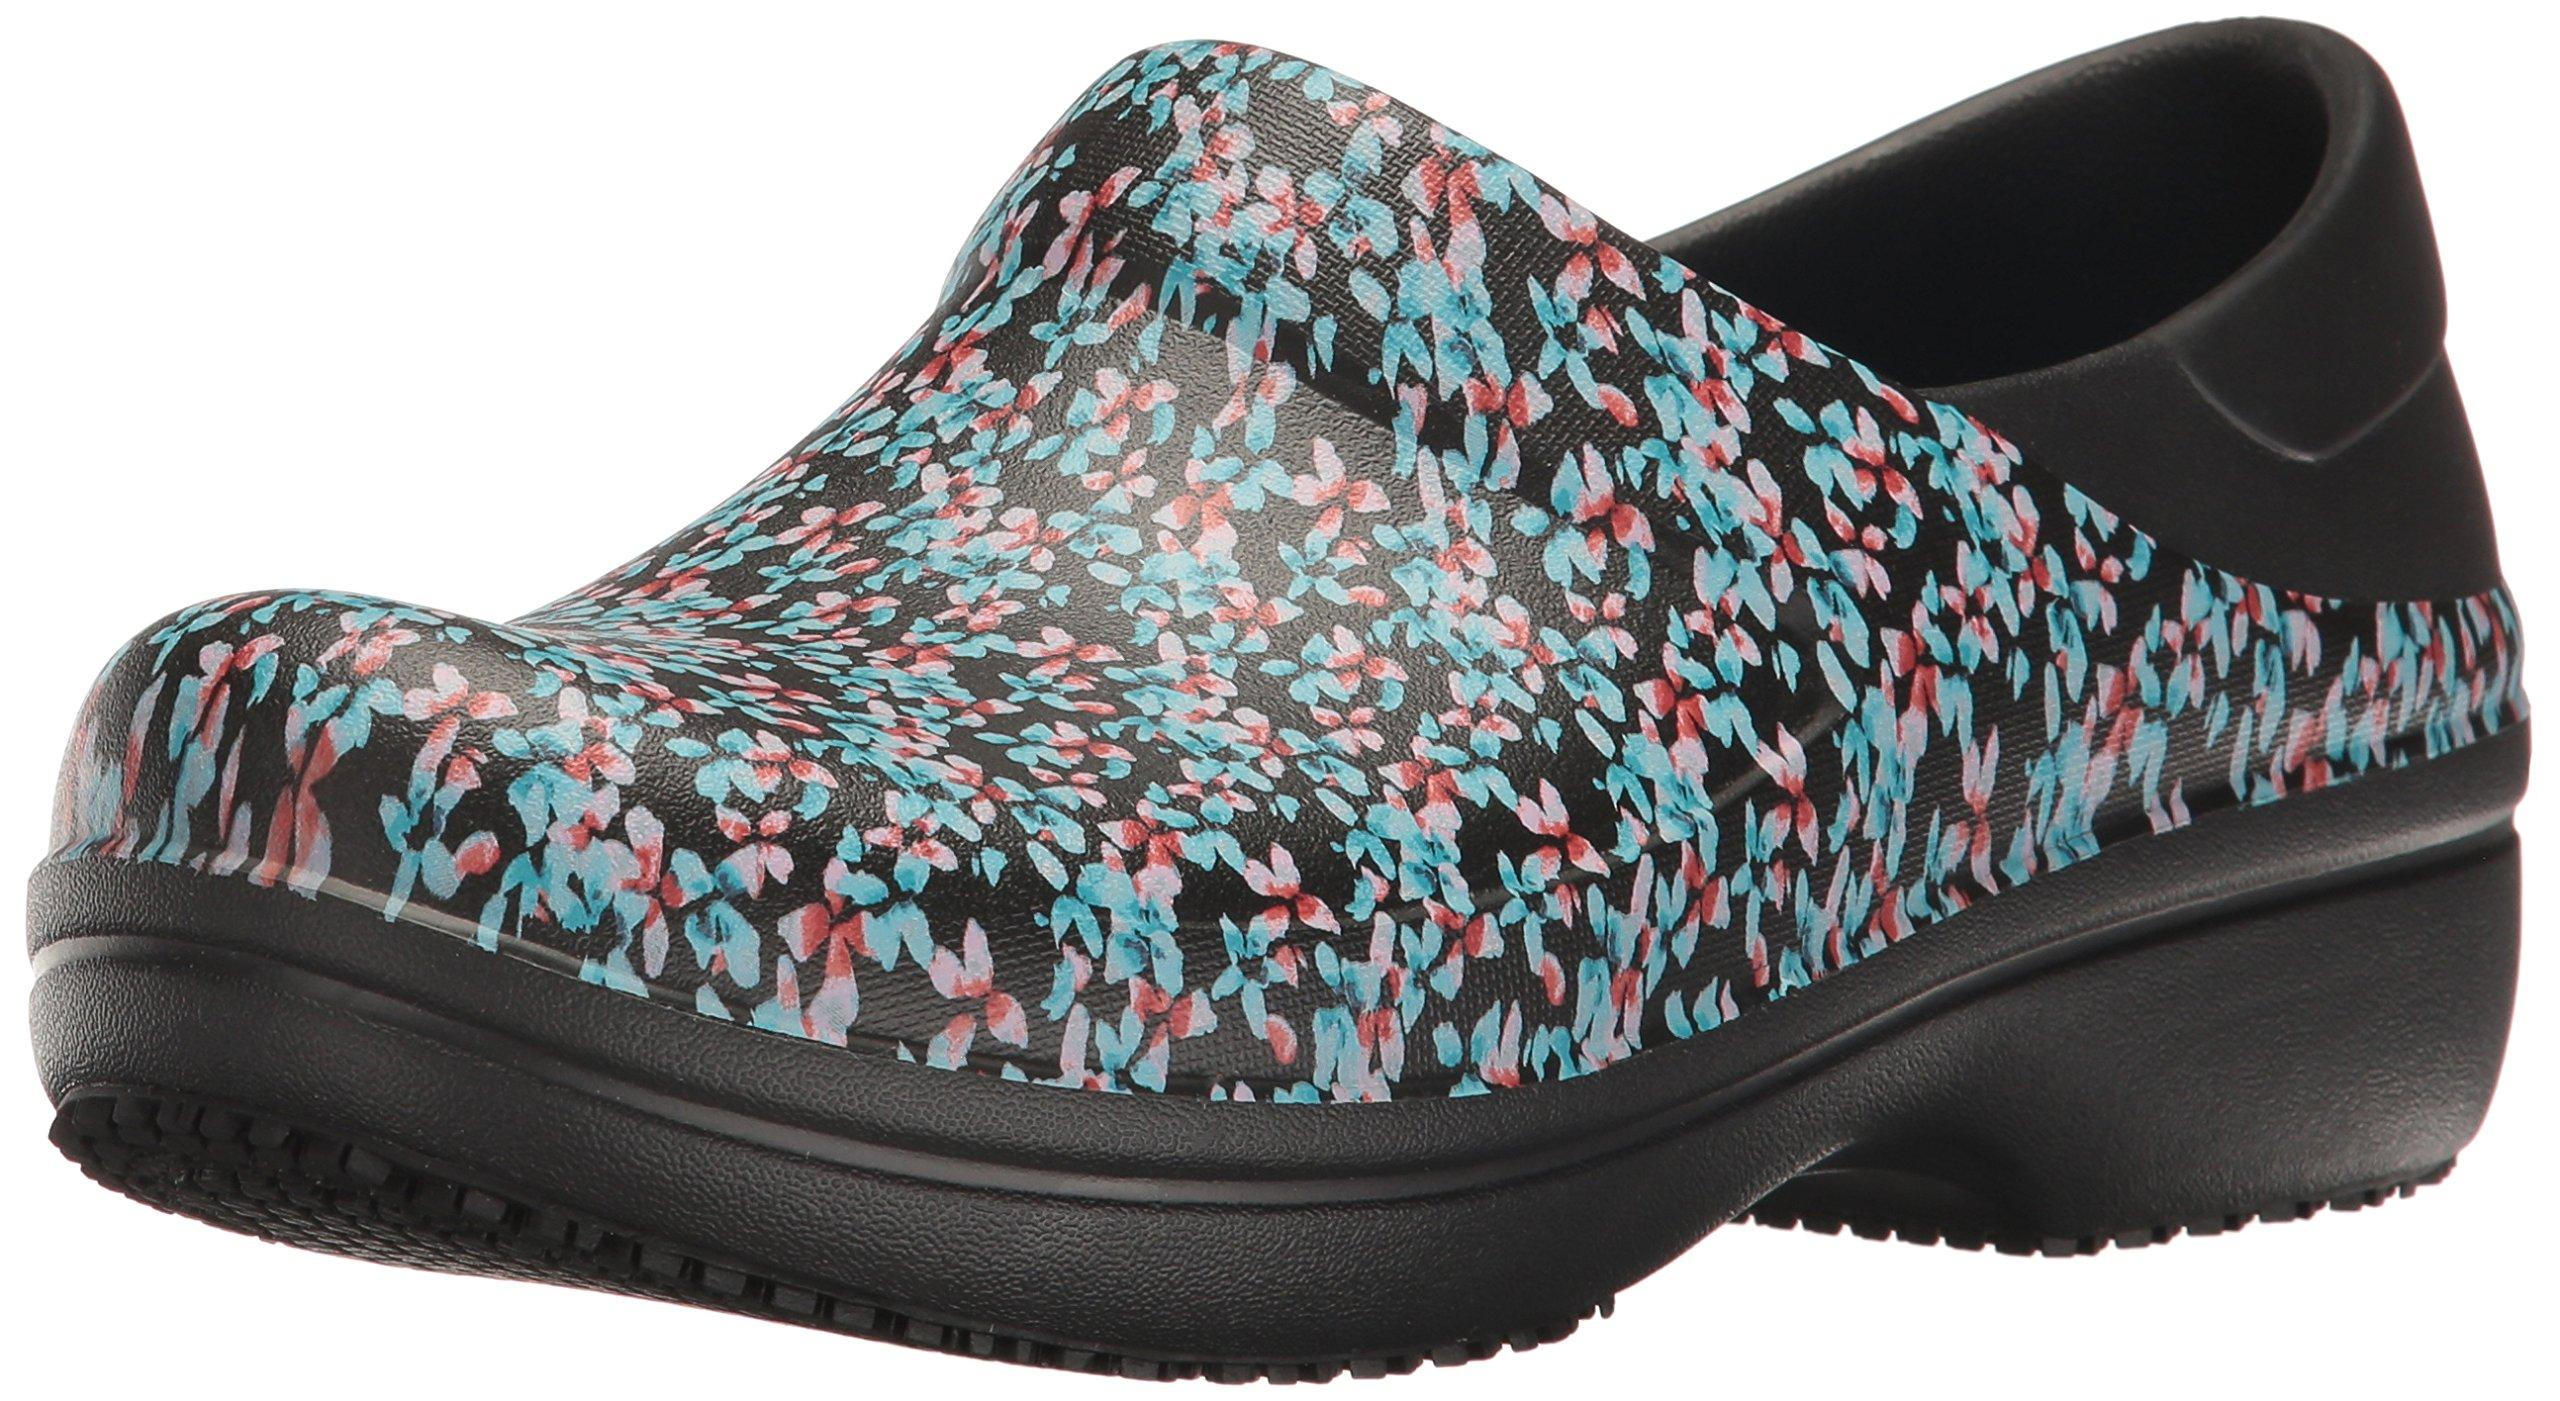 crocs Women's Neria Pro Graphic Clog W Mule, Black/Ice Blue, 8 M US by Crocs